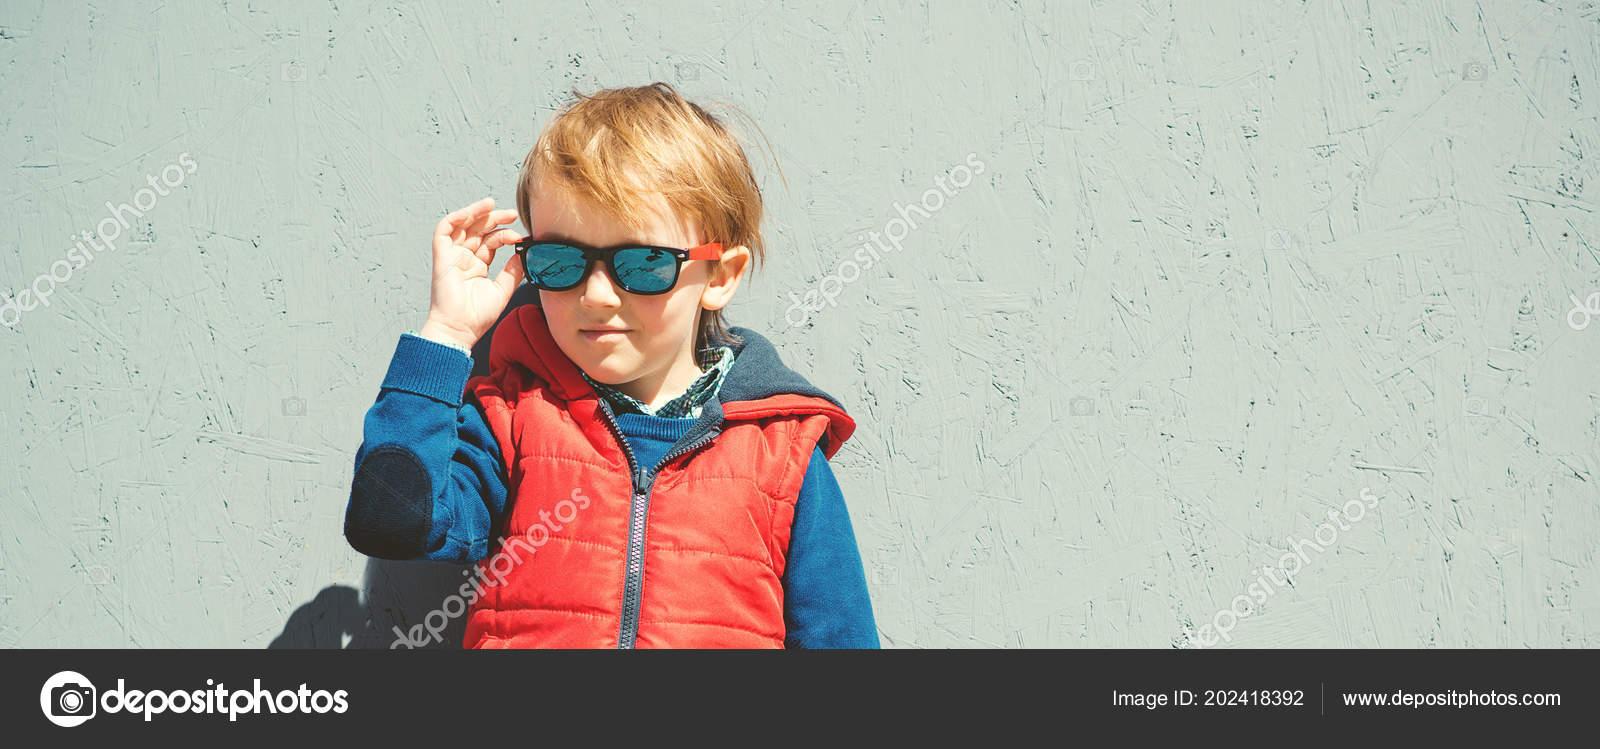 ddc303aa11e4 Stylish Kid Trendy Sunglasses Kids Fashion Cute Little Blondy Boy — Stock  Photo